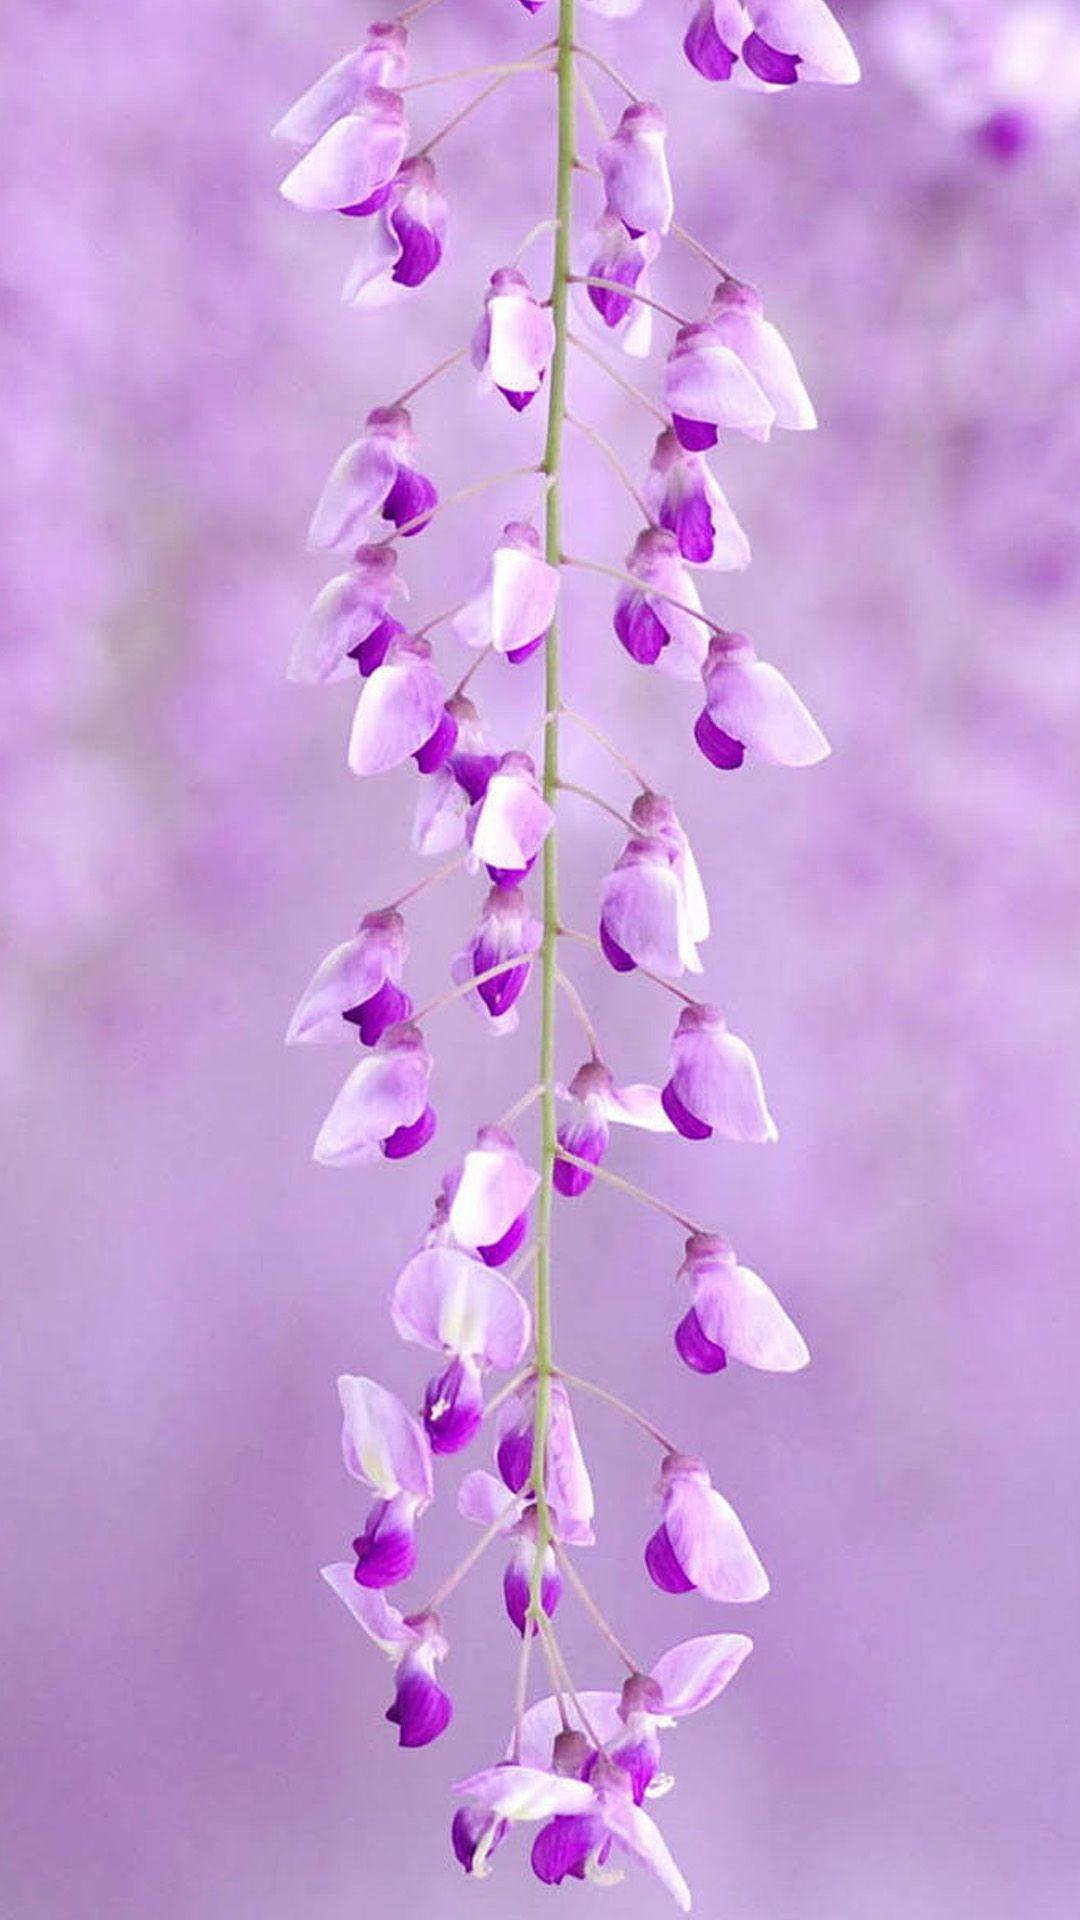 Small Purple Flowers Samsung Galaxy S5 Samsung Galaxy S5